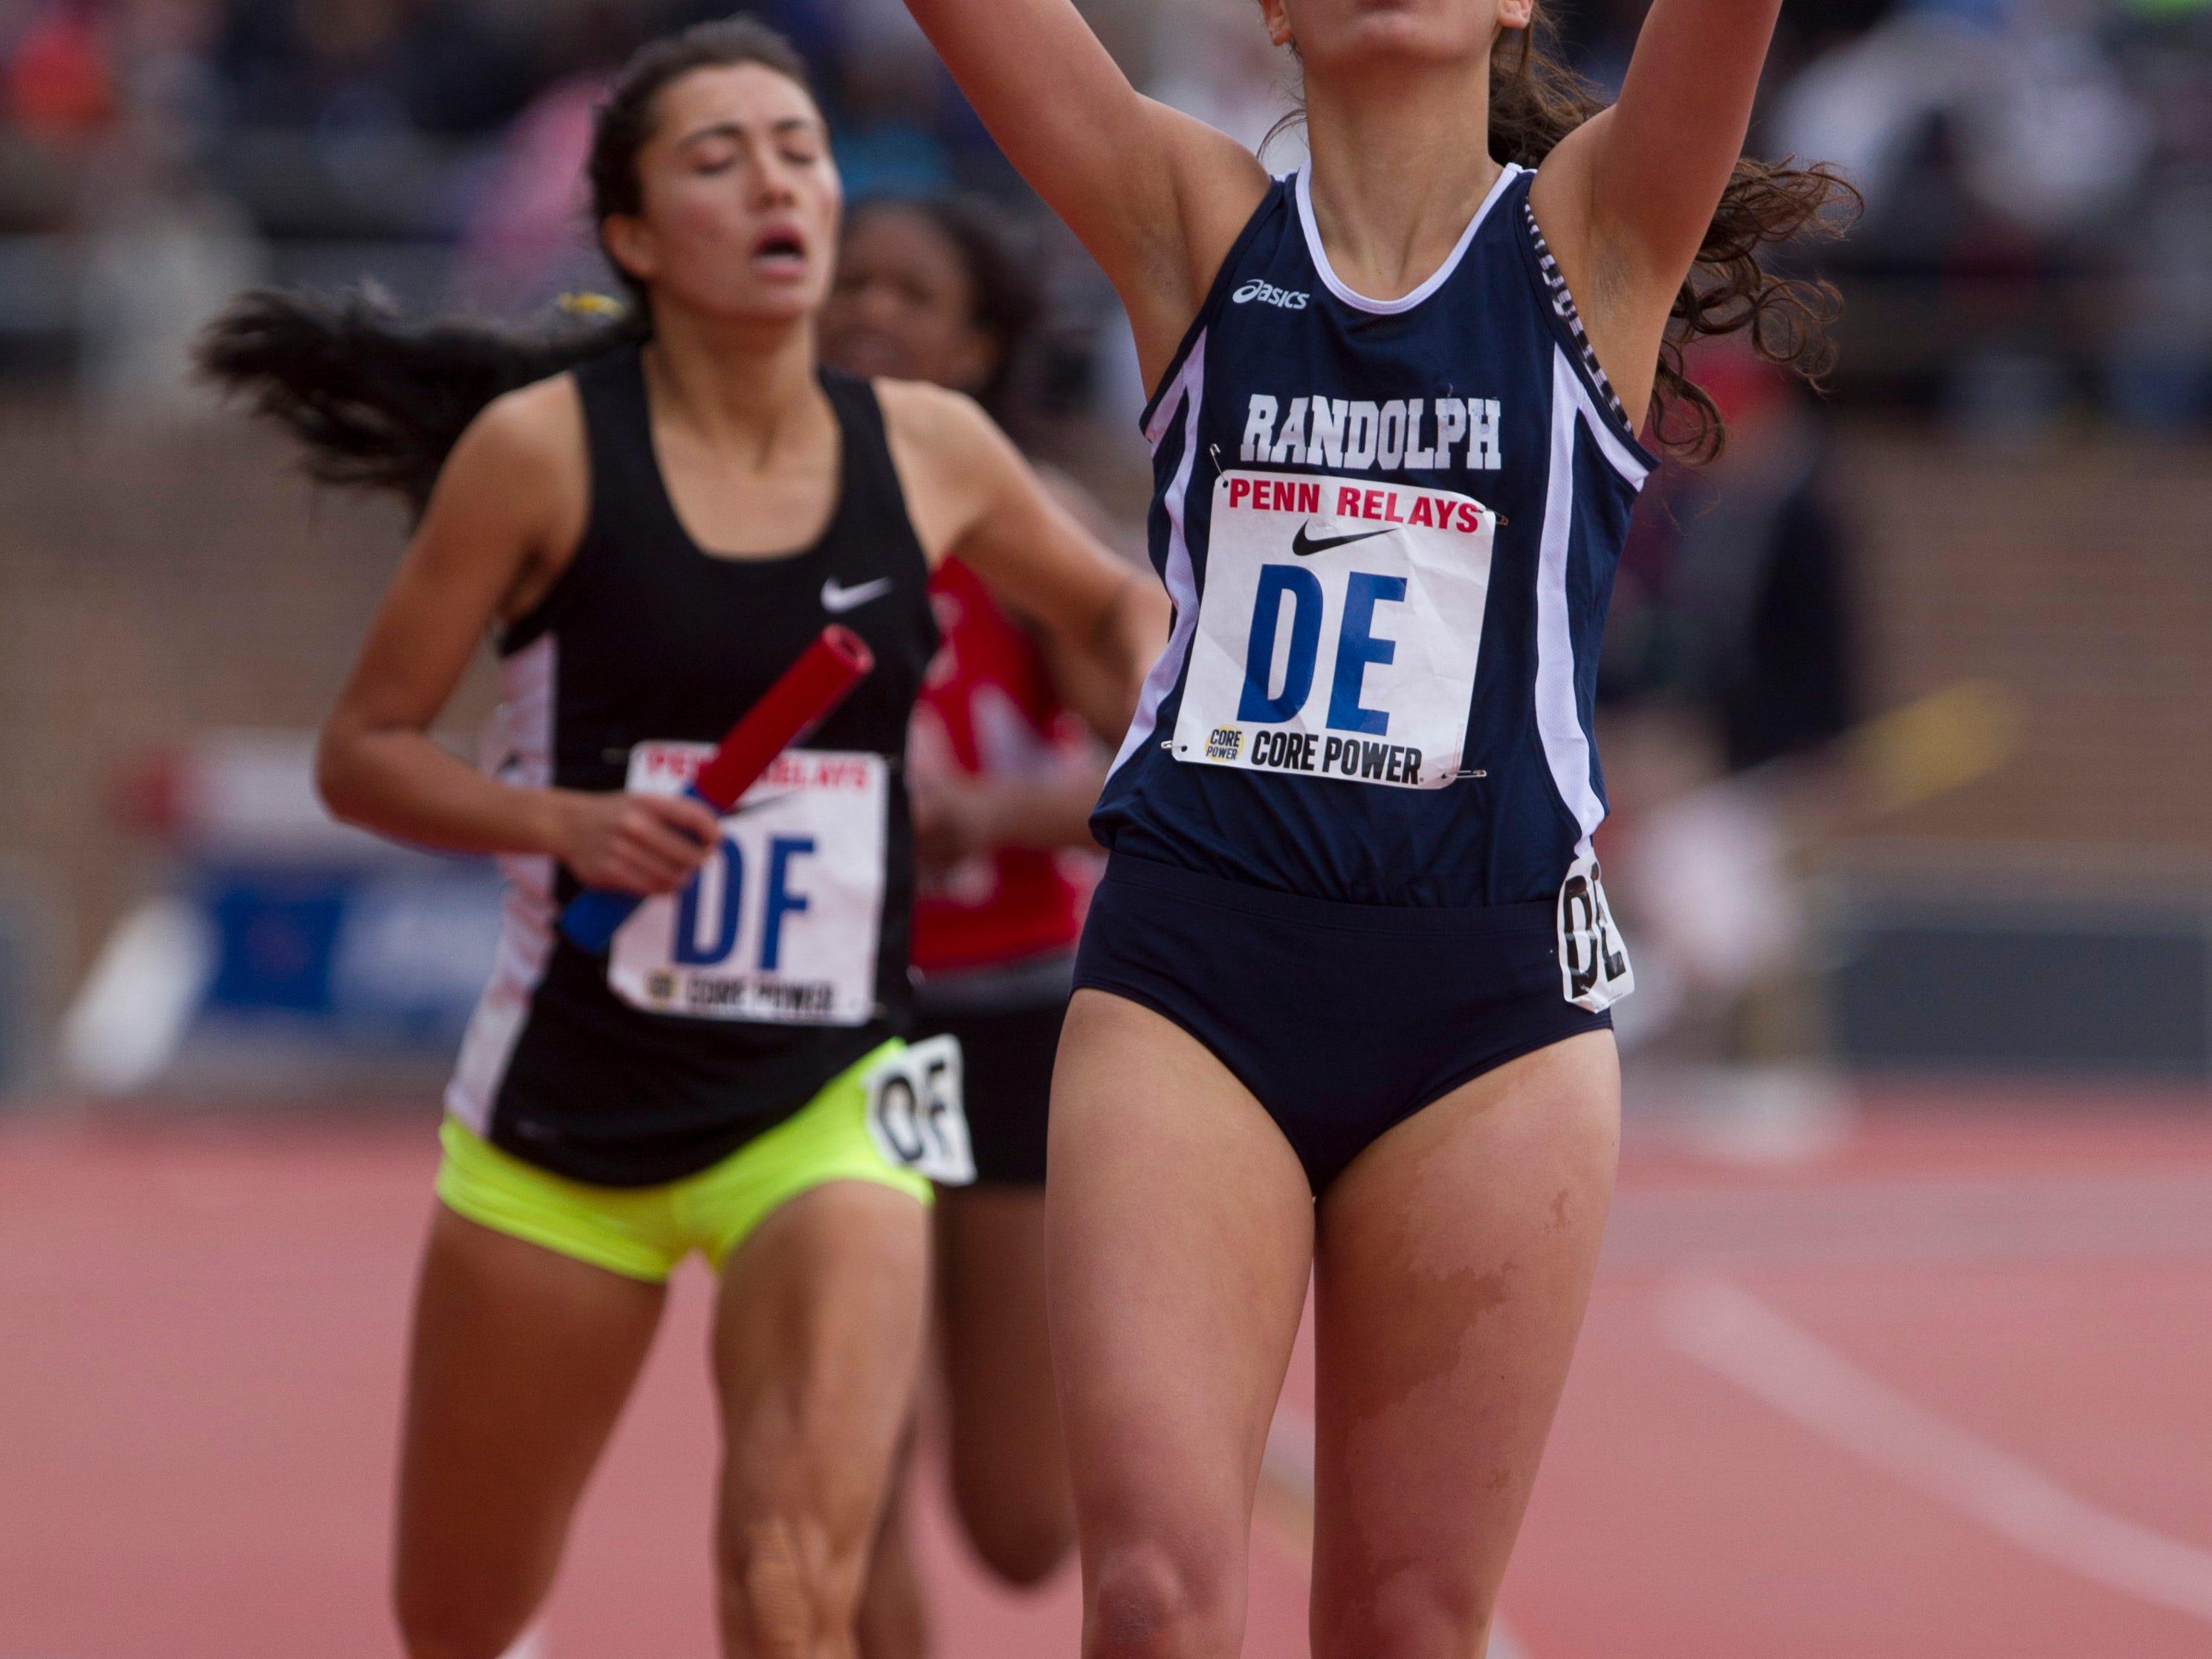 Randolph senior Liz Lansing points skyward as she crosses the finish line in a large-school 4x800 heat on Thursday at Penn Relays.